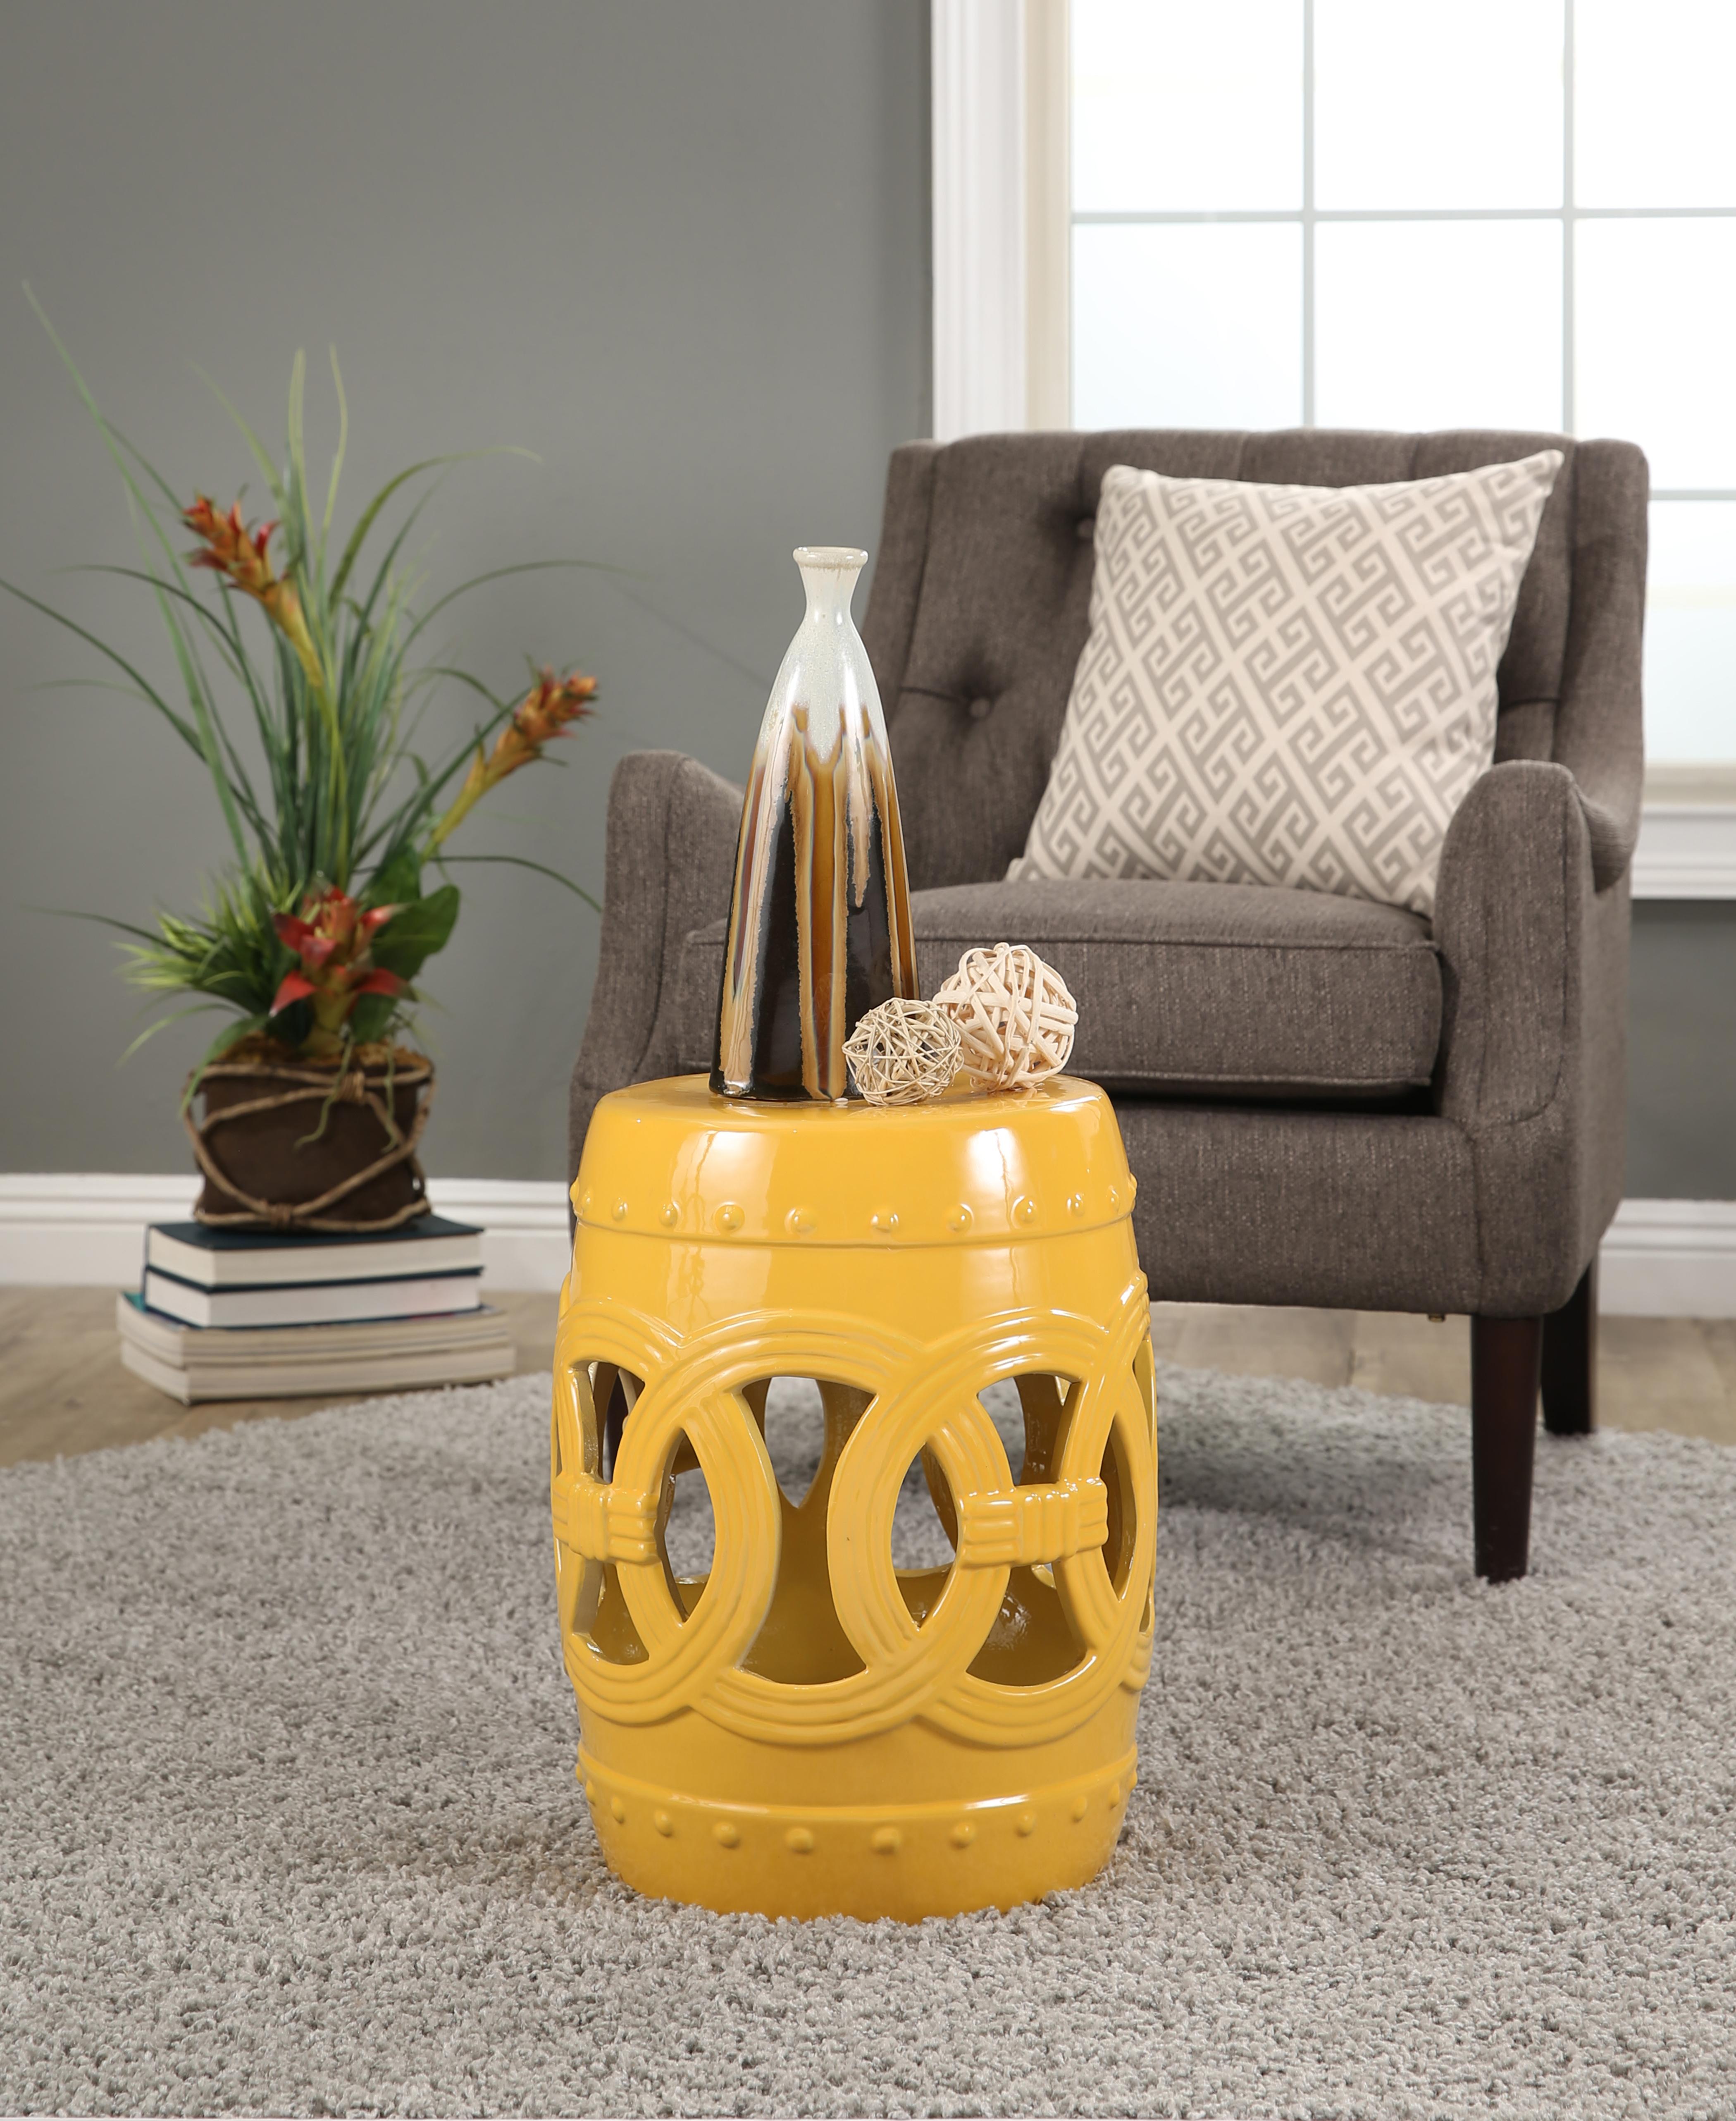 Abbyson Living ceramic garden stool